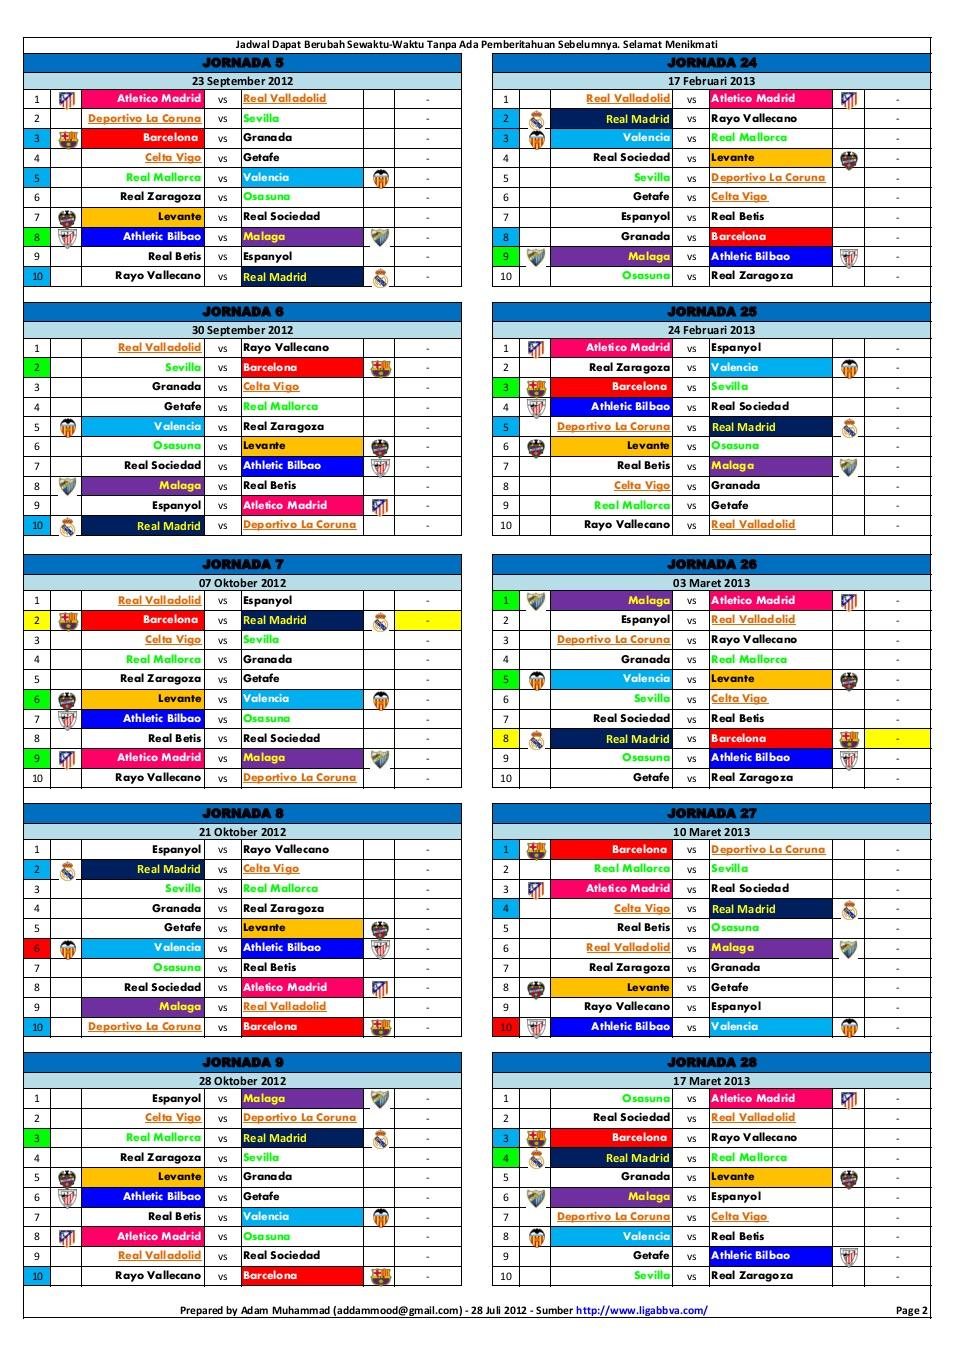 Nonton Liga Spanyol Online